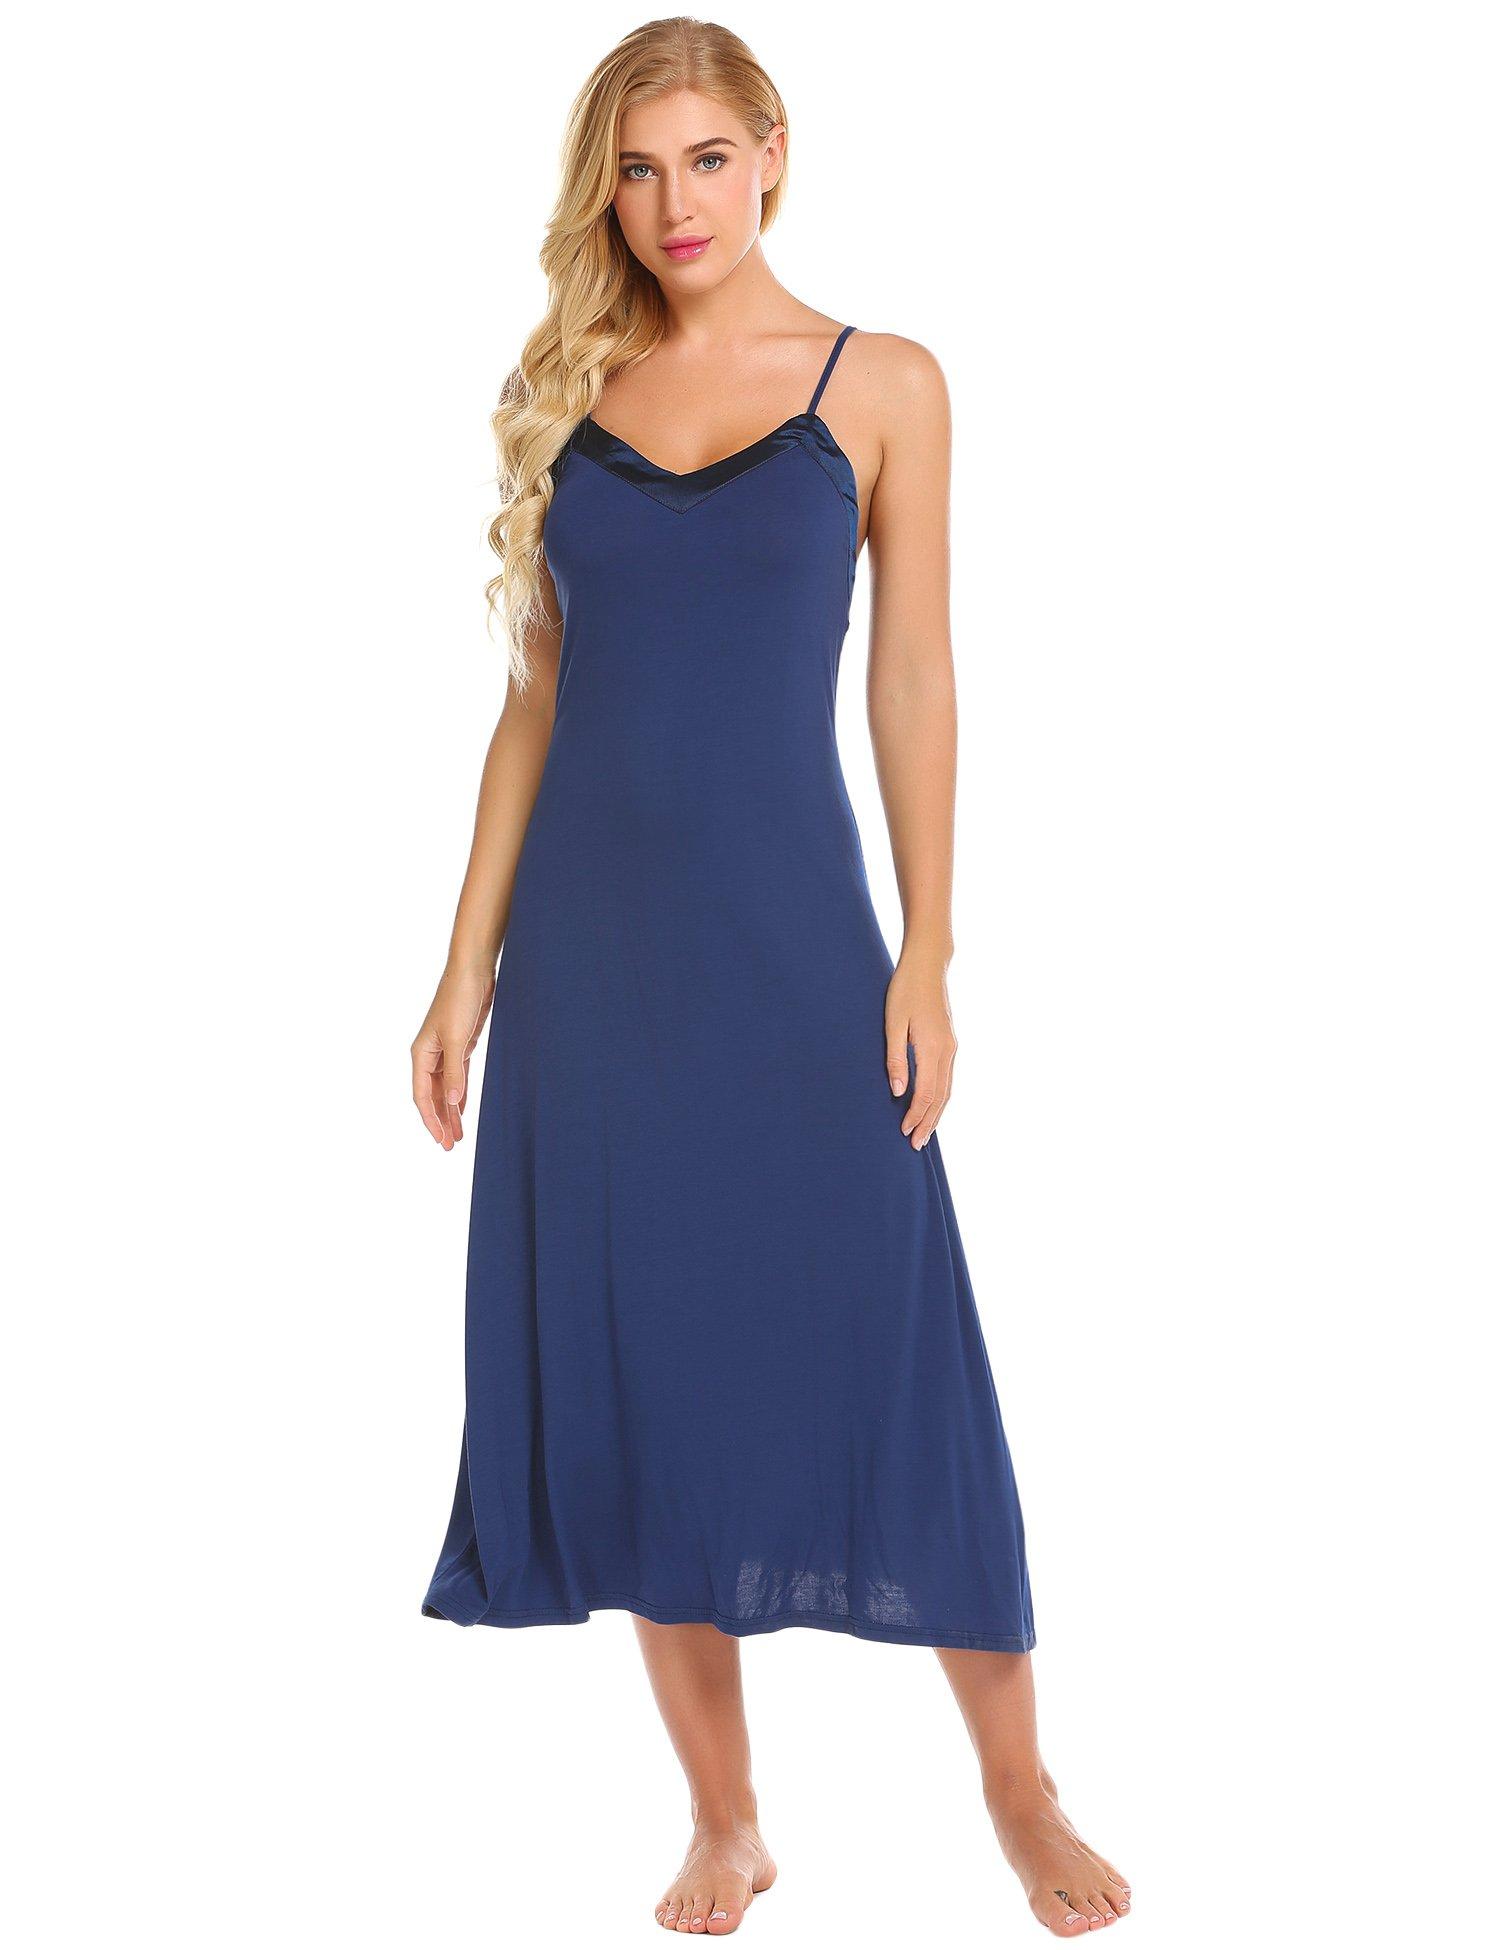 Ekouaer Womens Sleeveless Long Nightgown Summer Slip Night Dress Cotton Sleepshirt Chemise,C navy Blue,Small